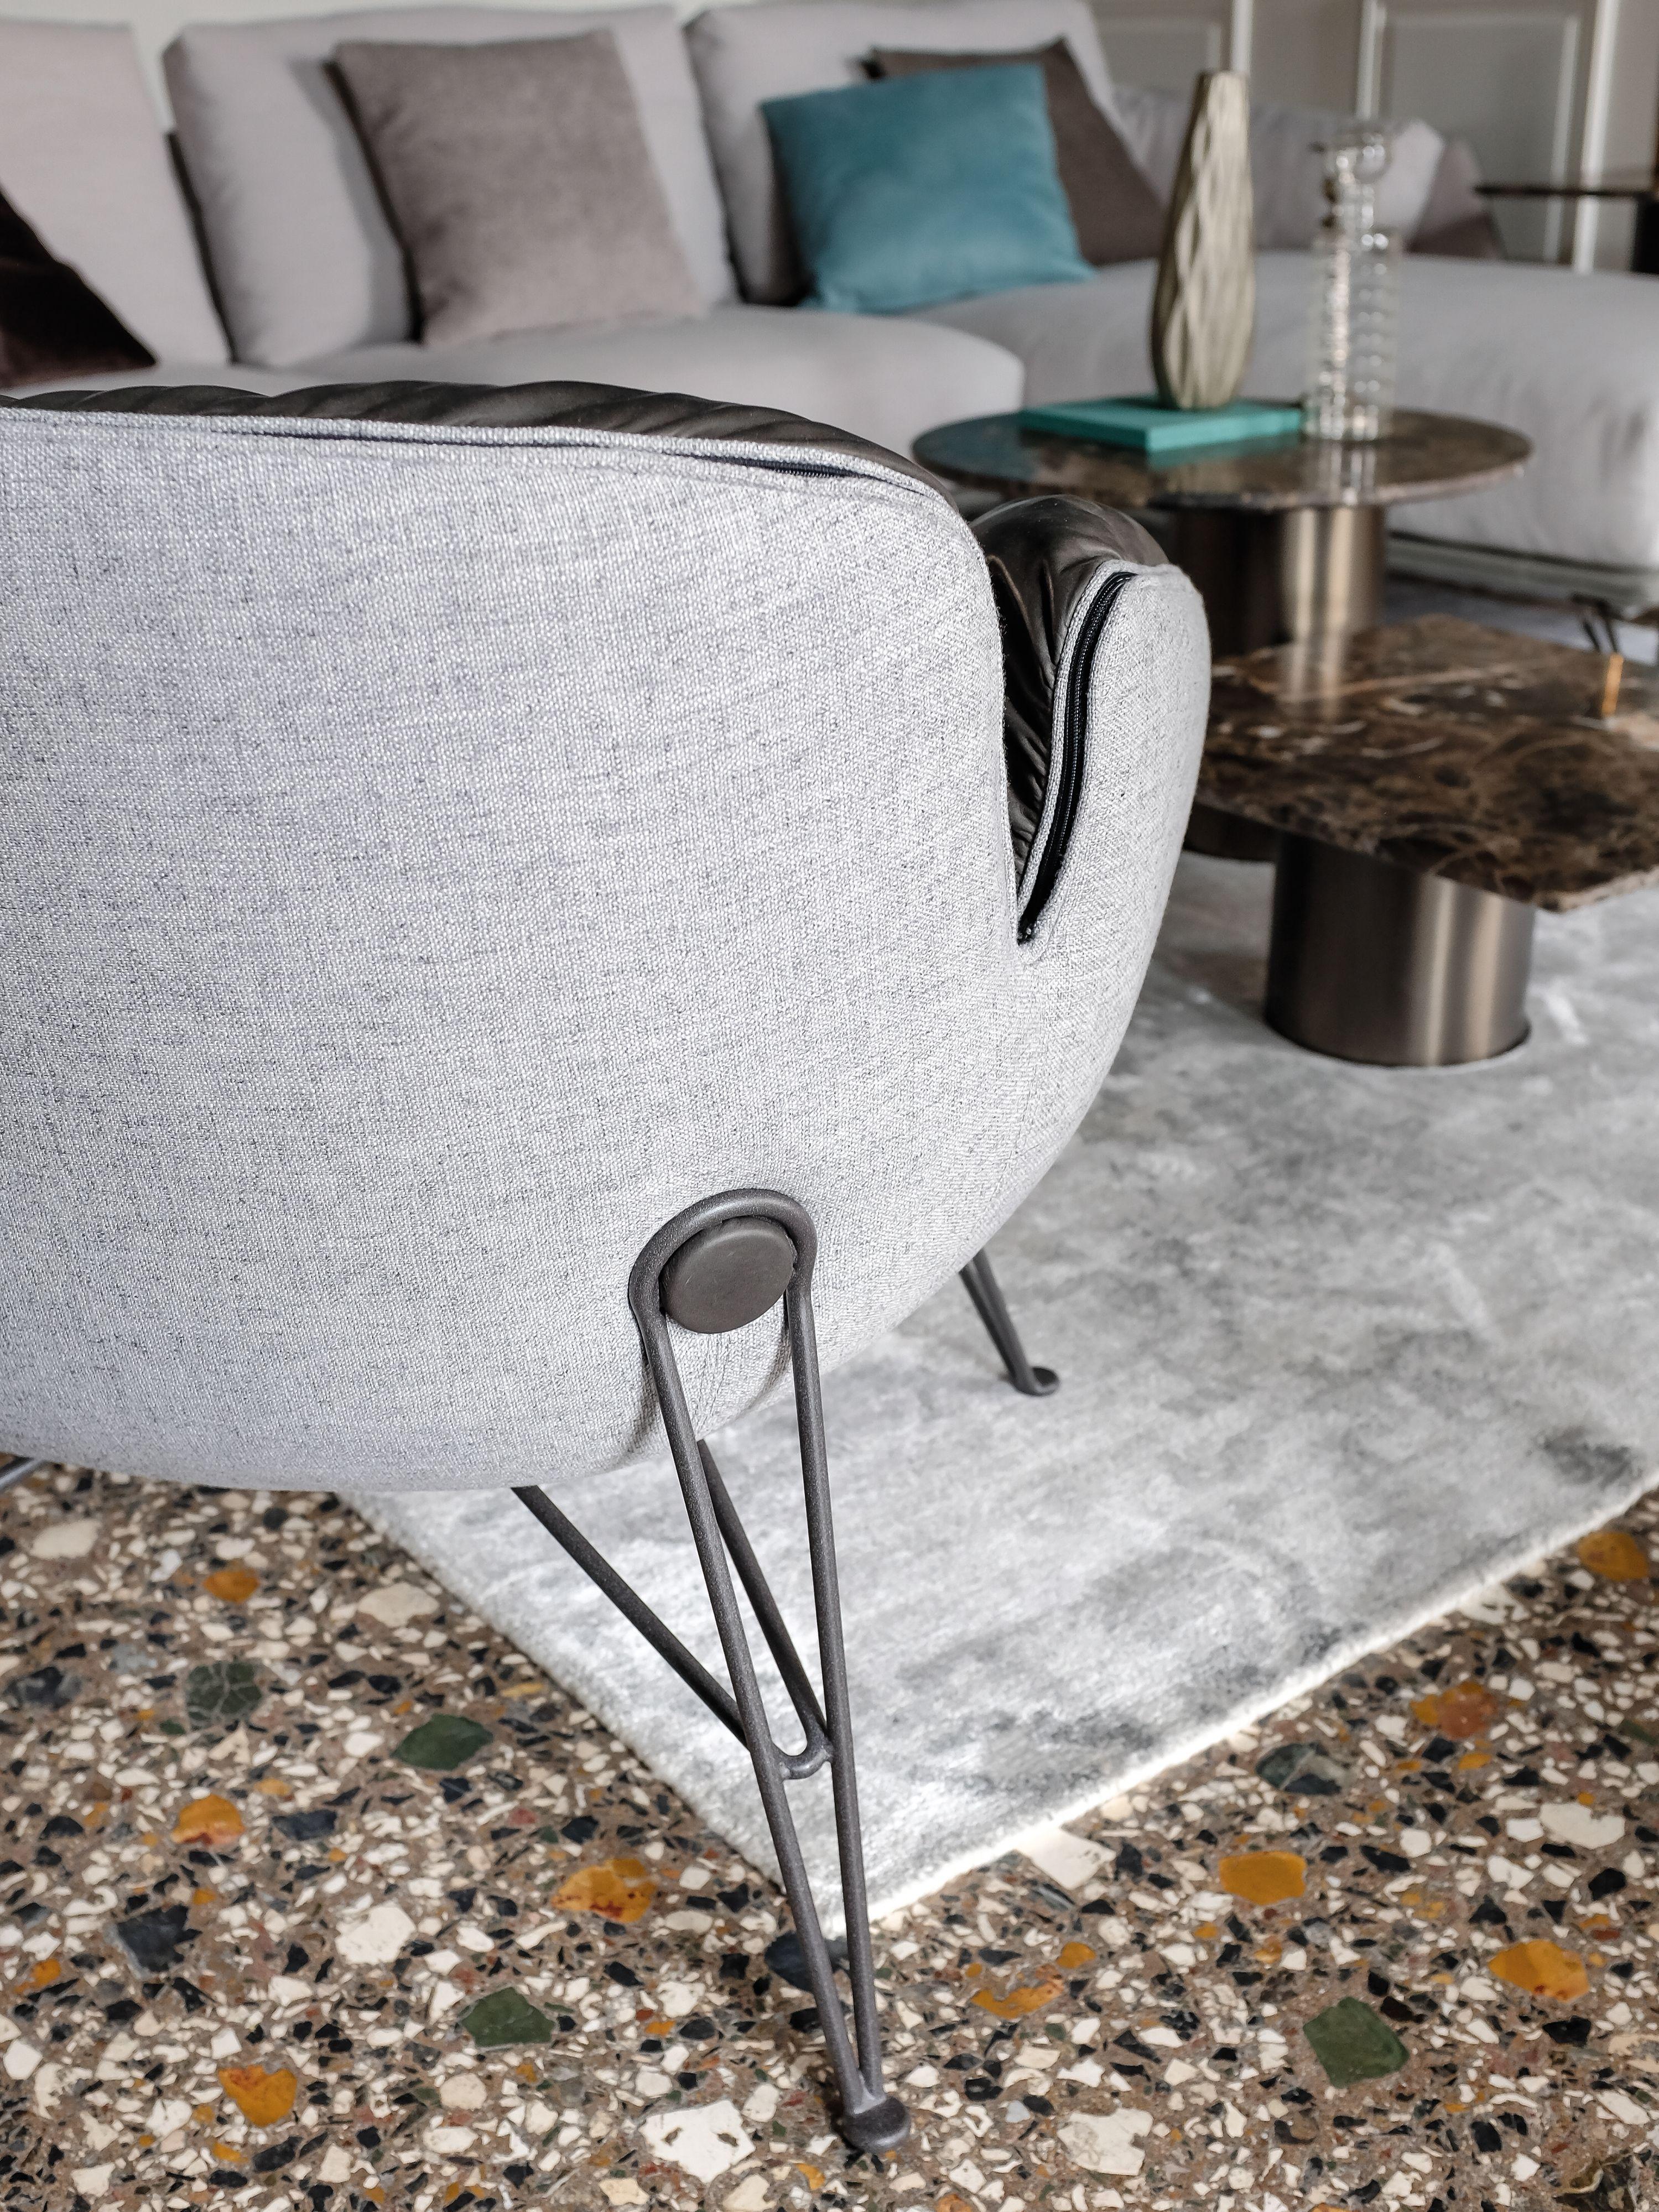 Furniture for Modern Living Room Design Idea | HOME DECO | Pinterest